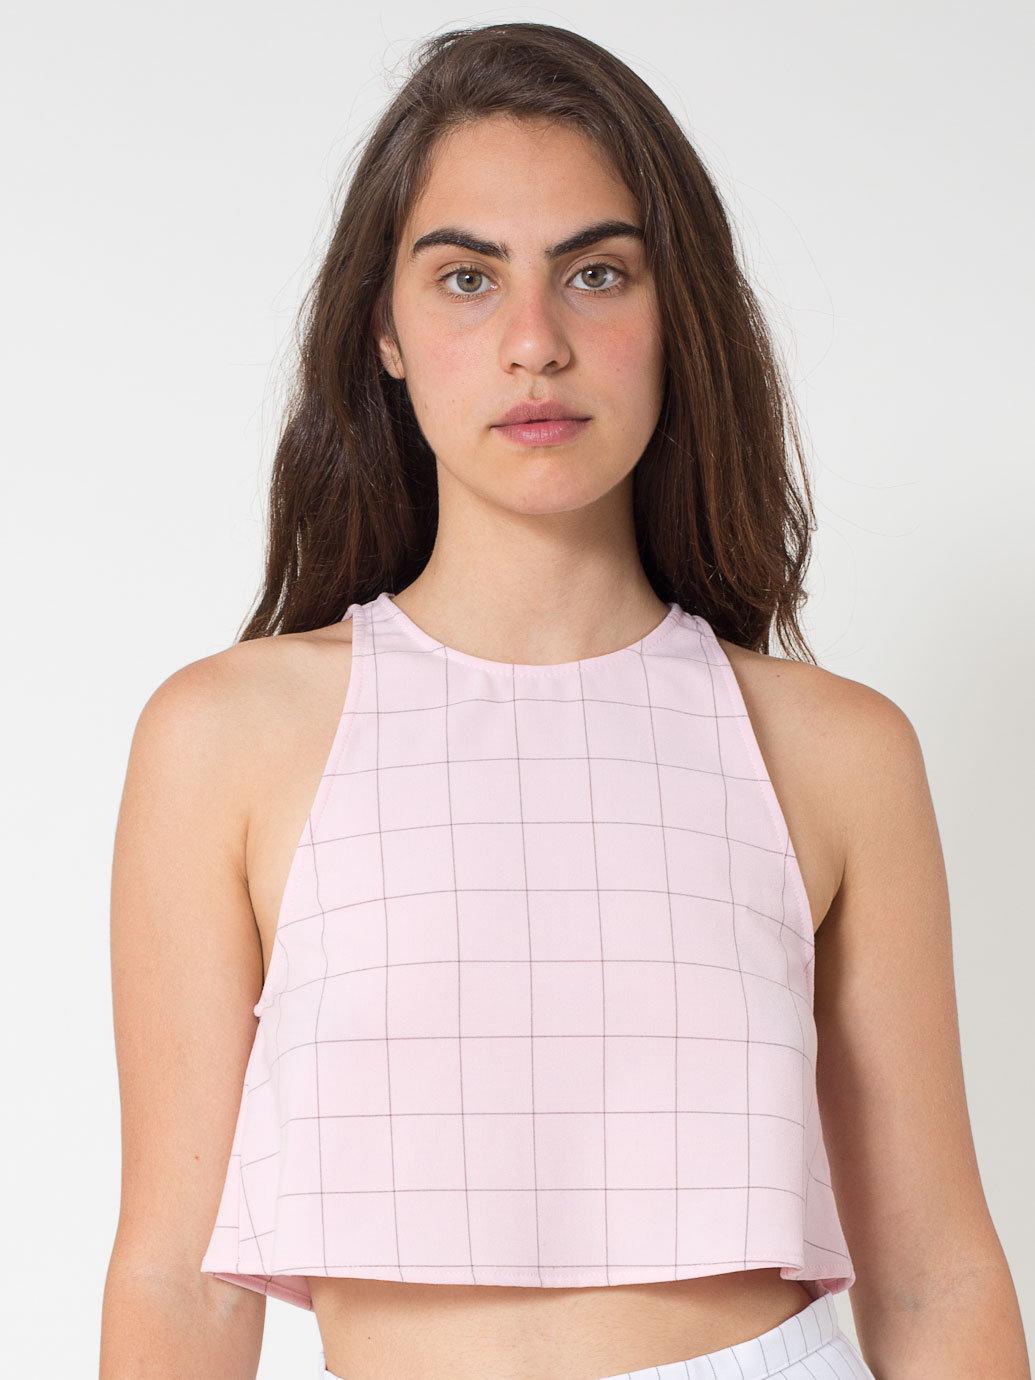 The Grid Print Lolita Crop | American Apparel